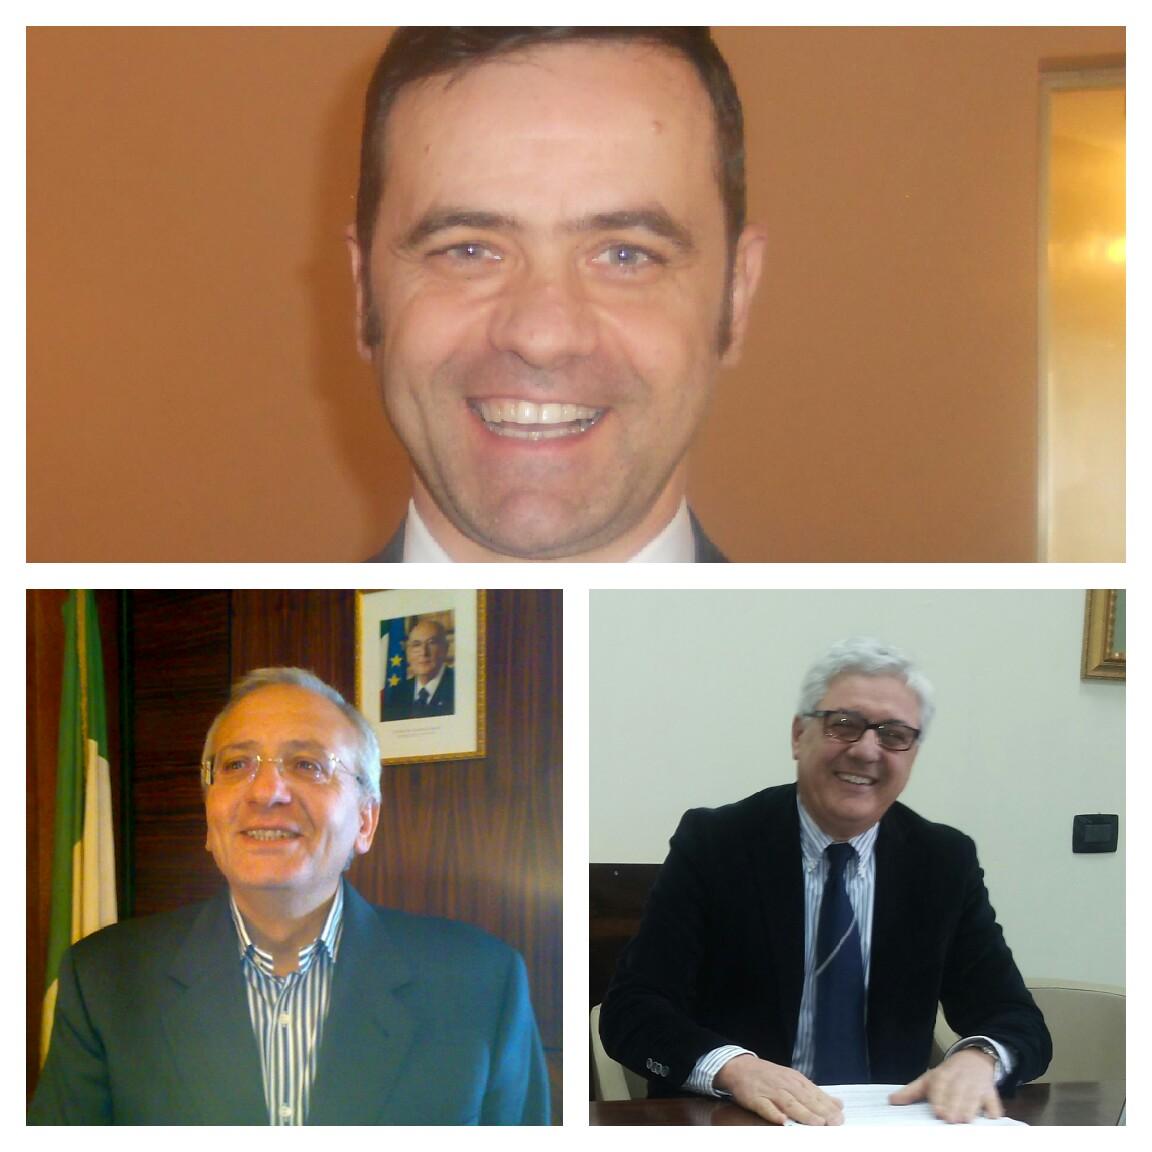 Antonio-Squillante-Fernando-Zara-Martino-Melchionda